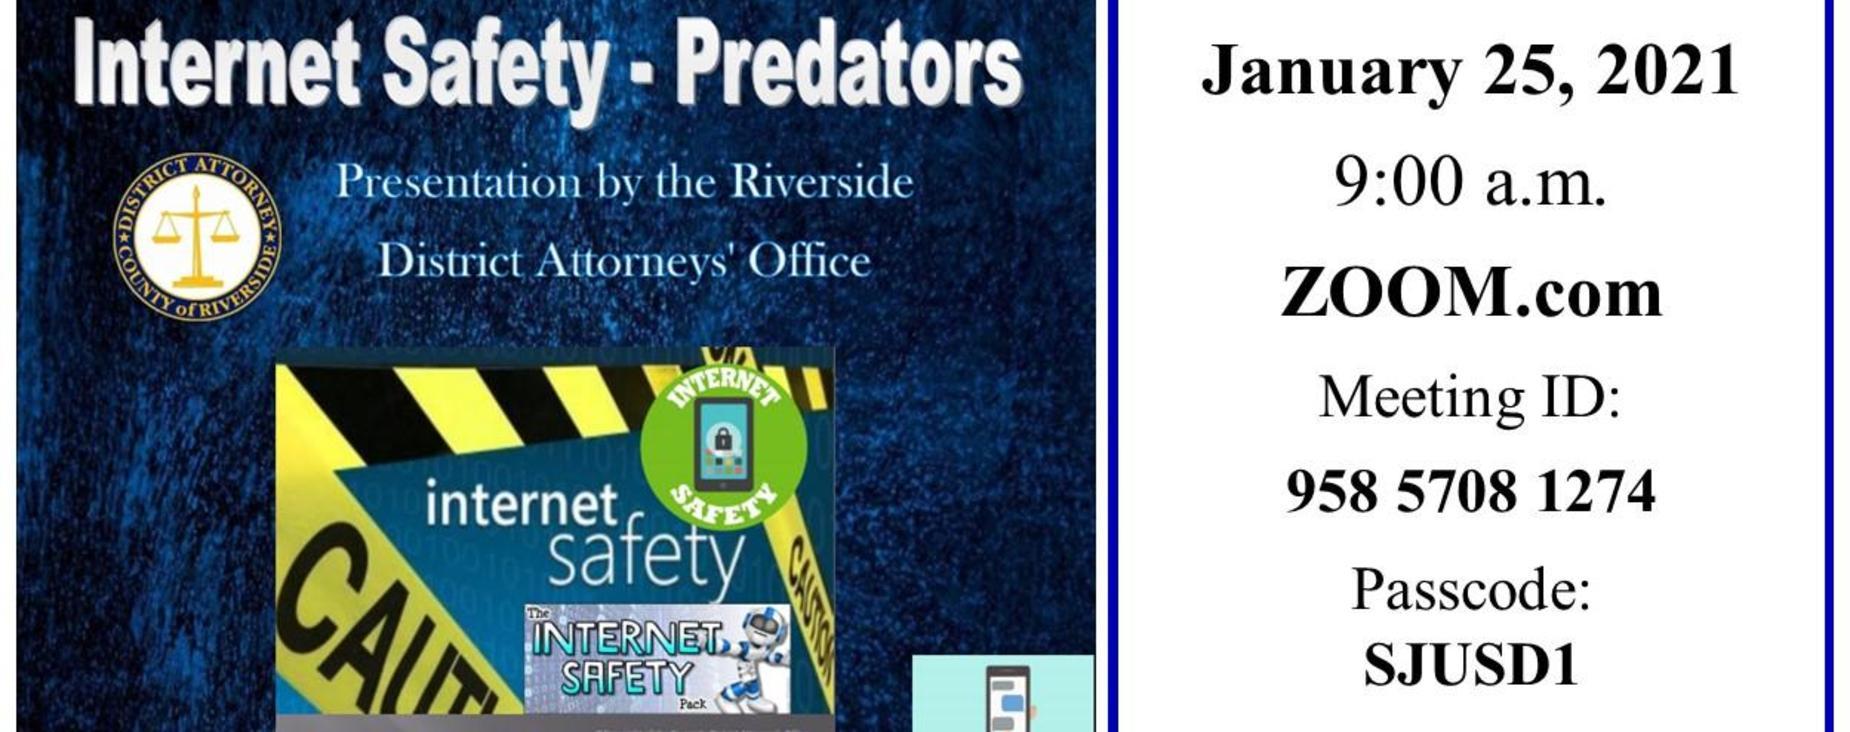 Internet Safety - Predators presentation by Riverside DA Office, Jan. 25, 9am, via Zoom.com